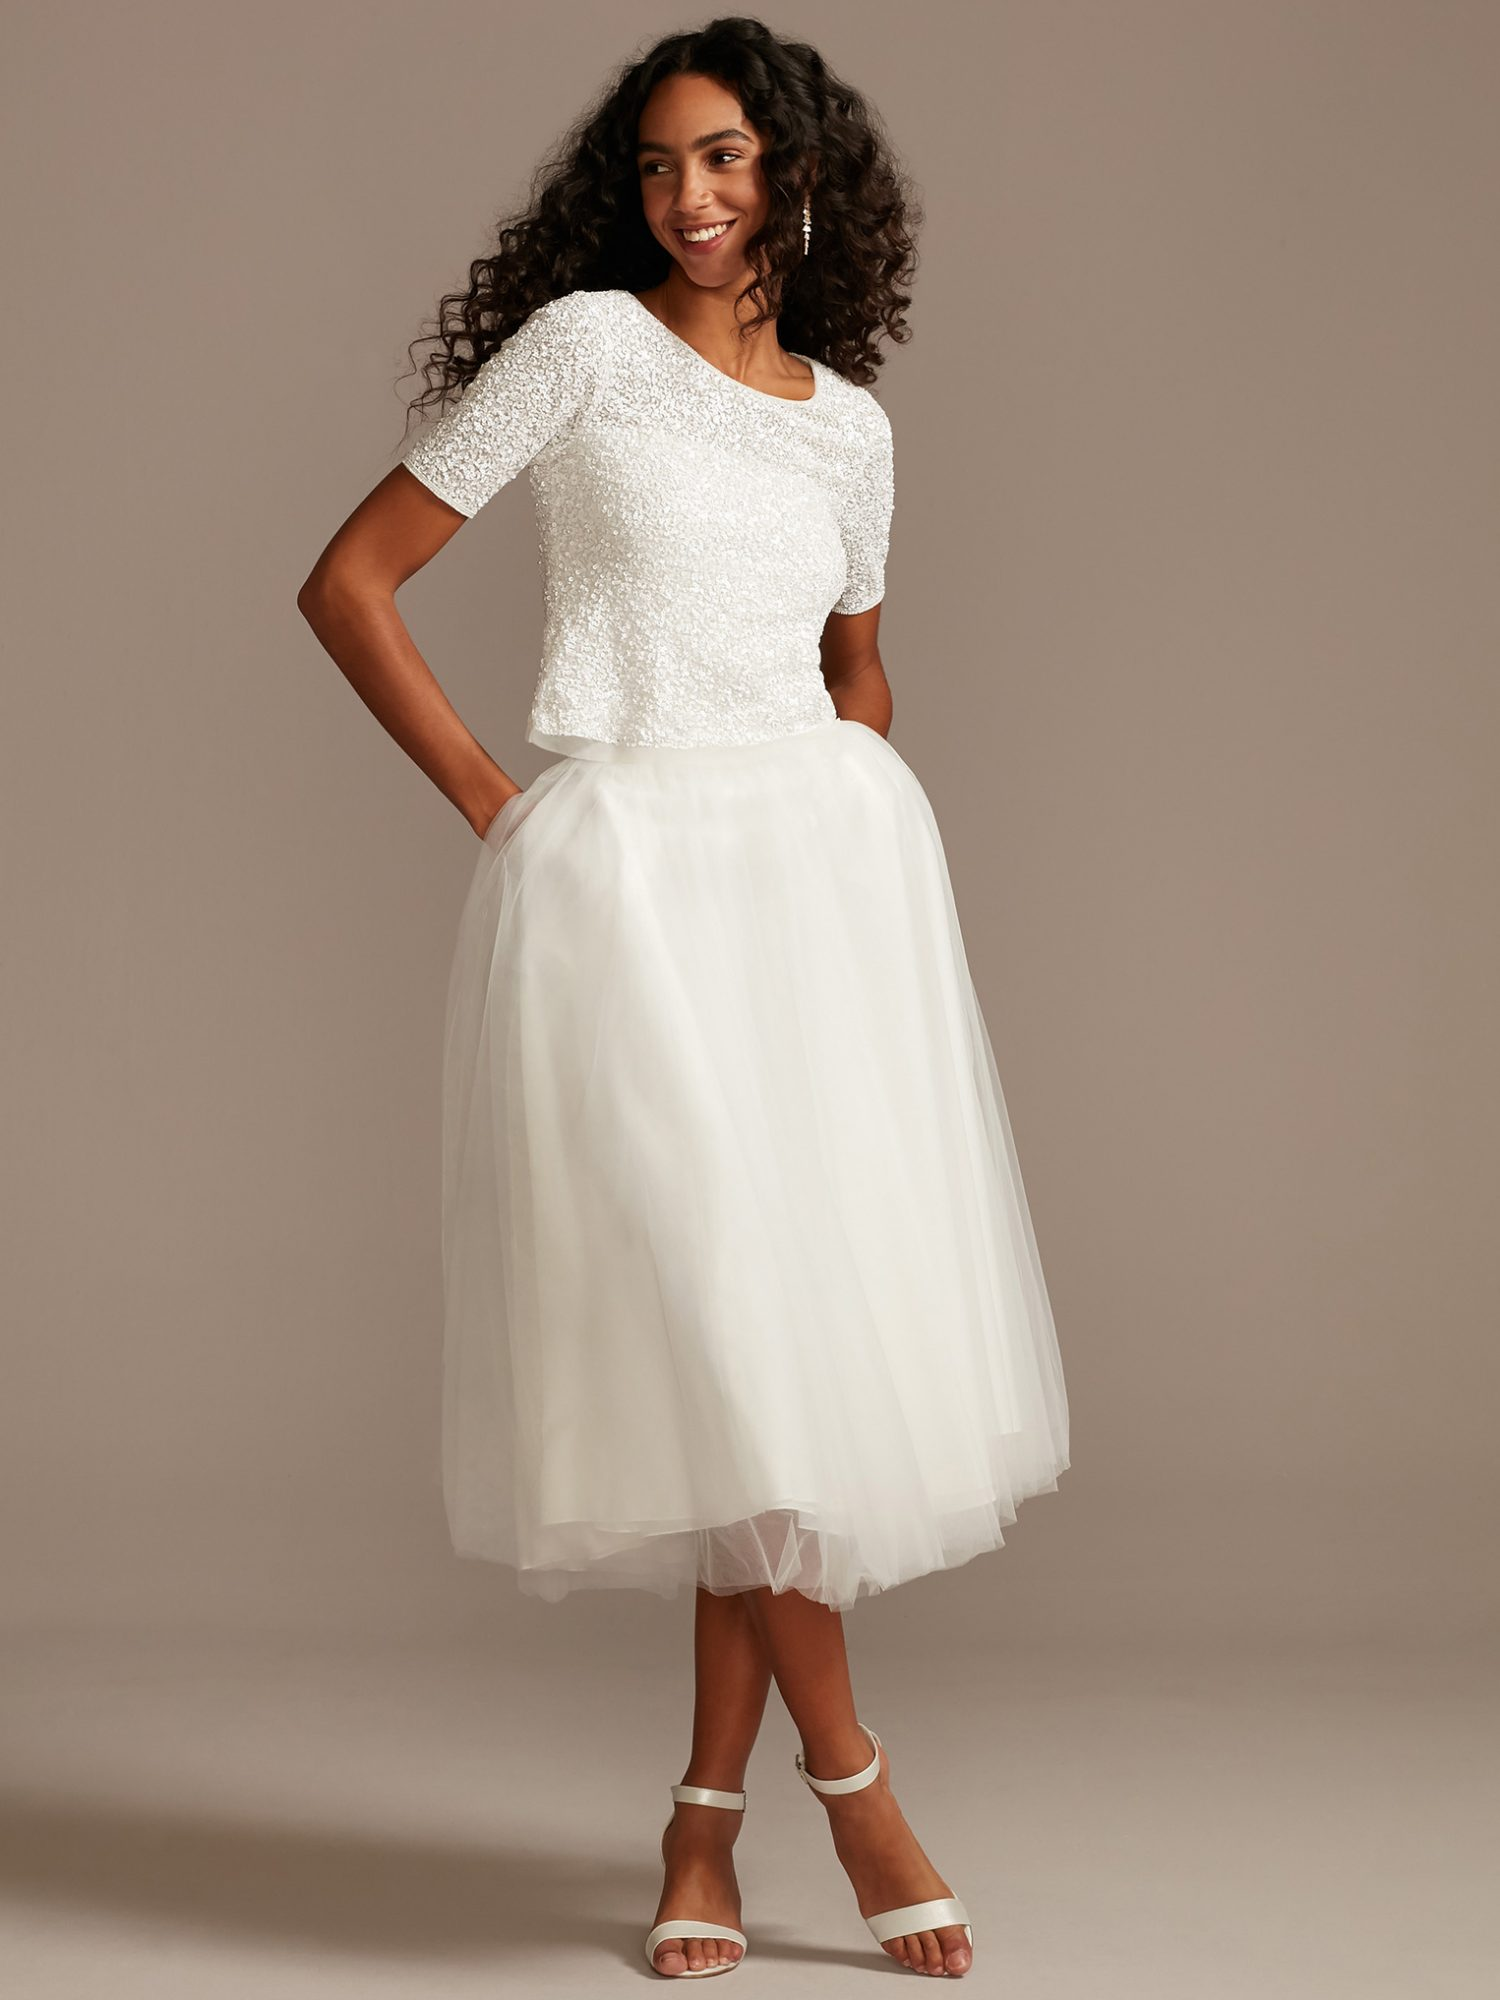 davids bridal two piece quarter sleeve glittery top with tea length tulle skirt wedding dress spring 2021